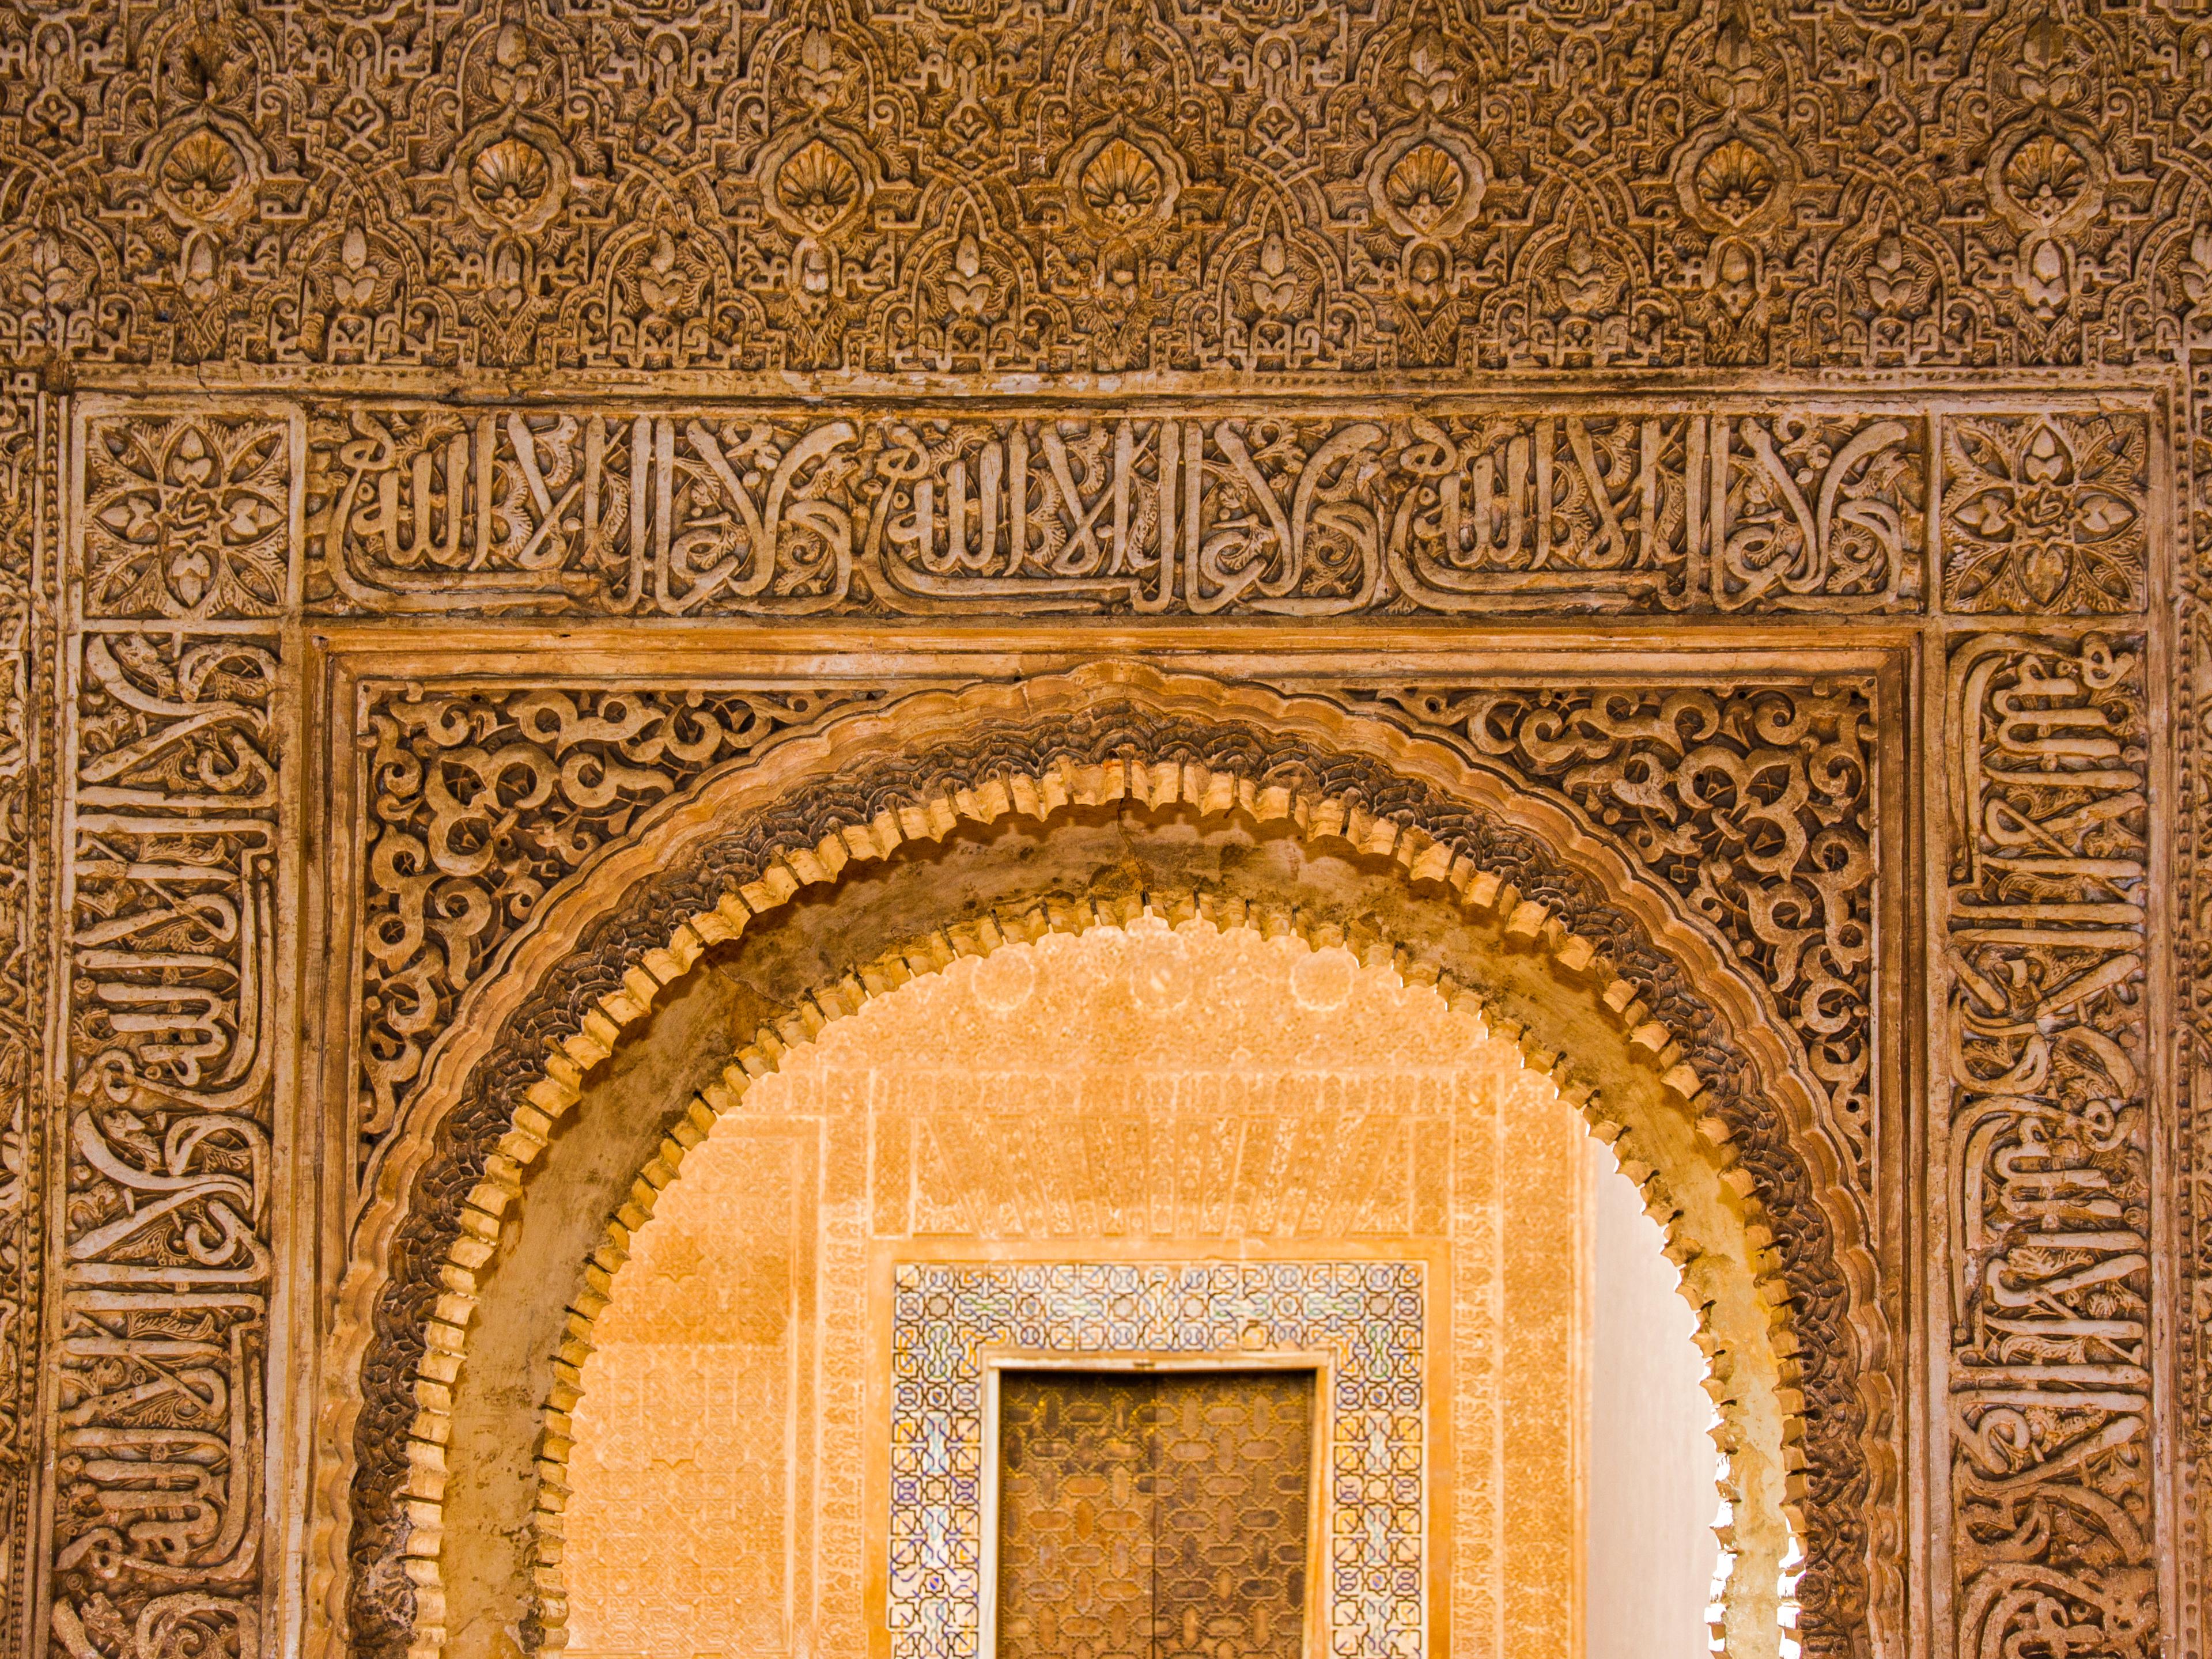 © Gilles Nicoud-Alhambra-IMG_8704